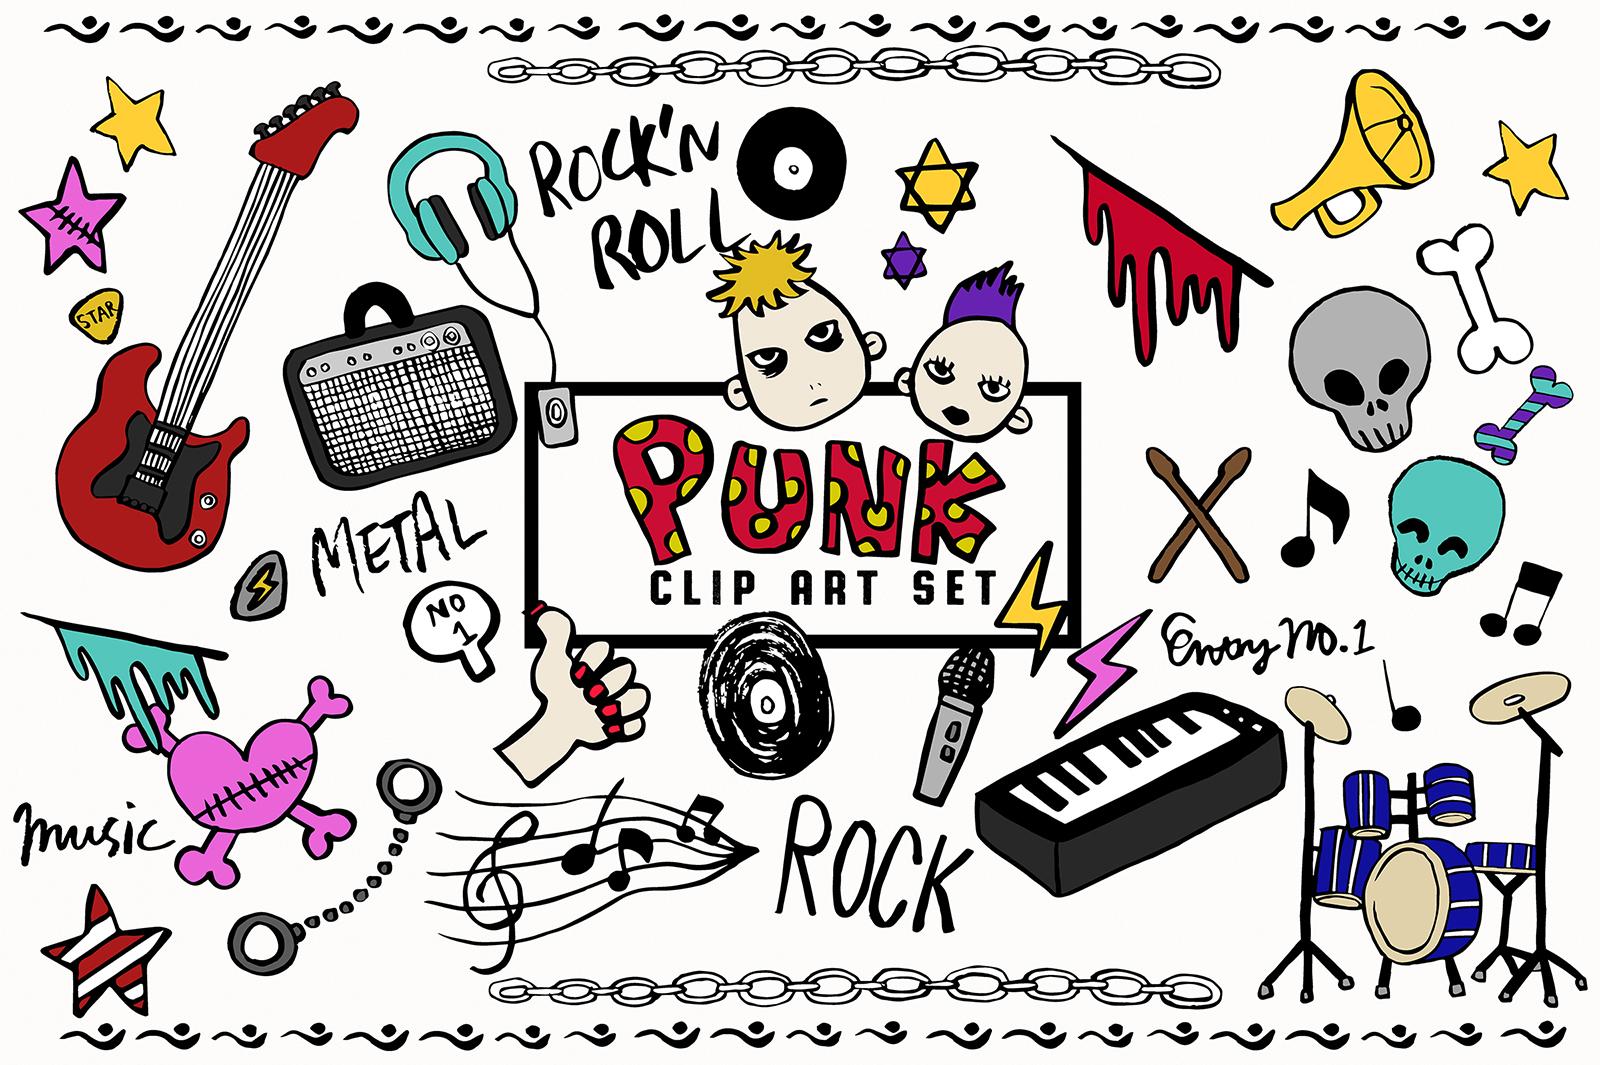 Doodled Illustration 02 Punk Rock example image 1